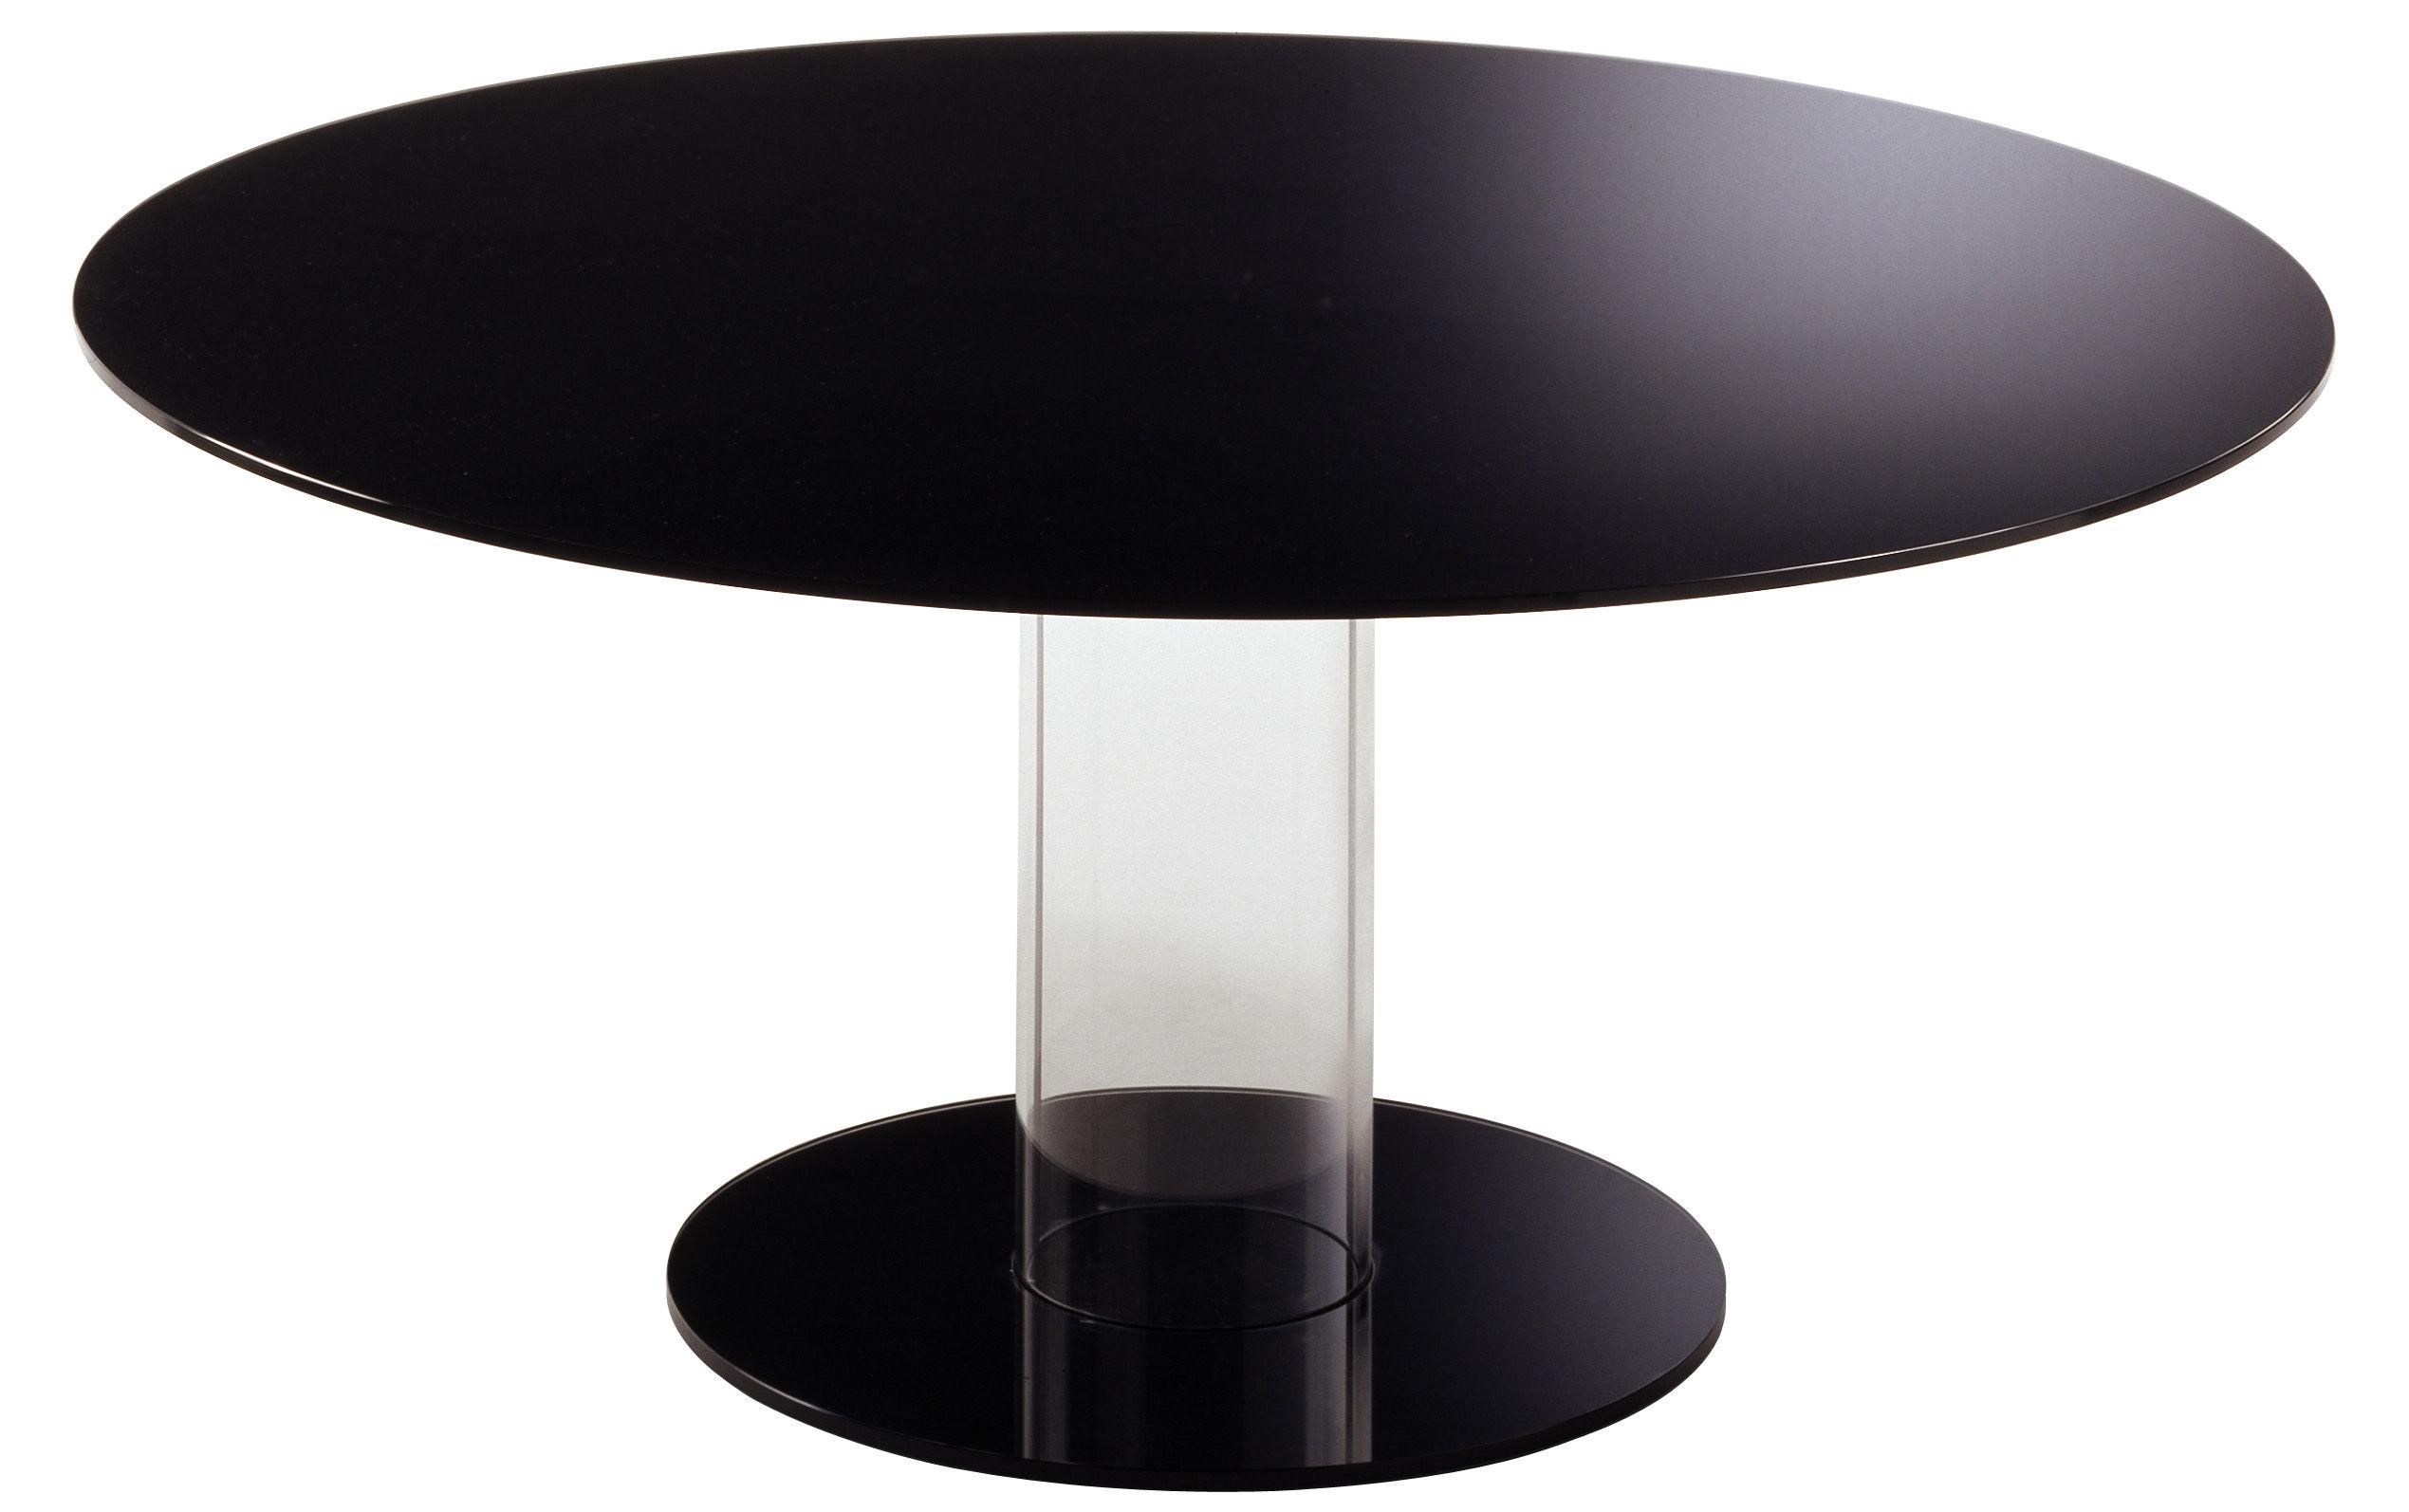 Mobilier - Tables - Table ronde Hub / Ø 160 cm - Glas Italia - Noir - Ø 160 cm - Verre